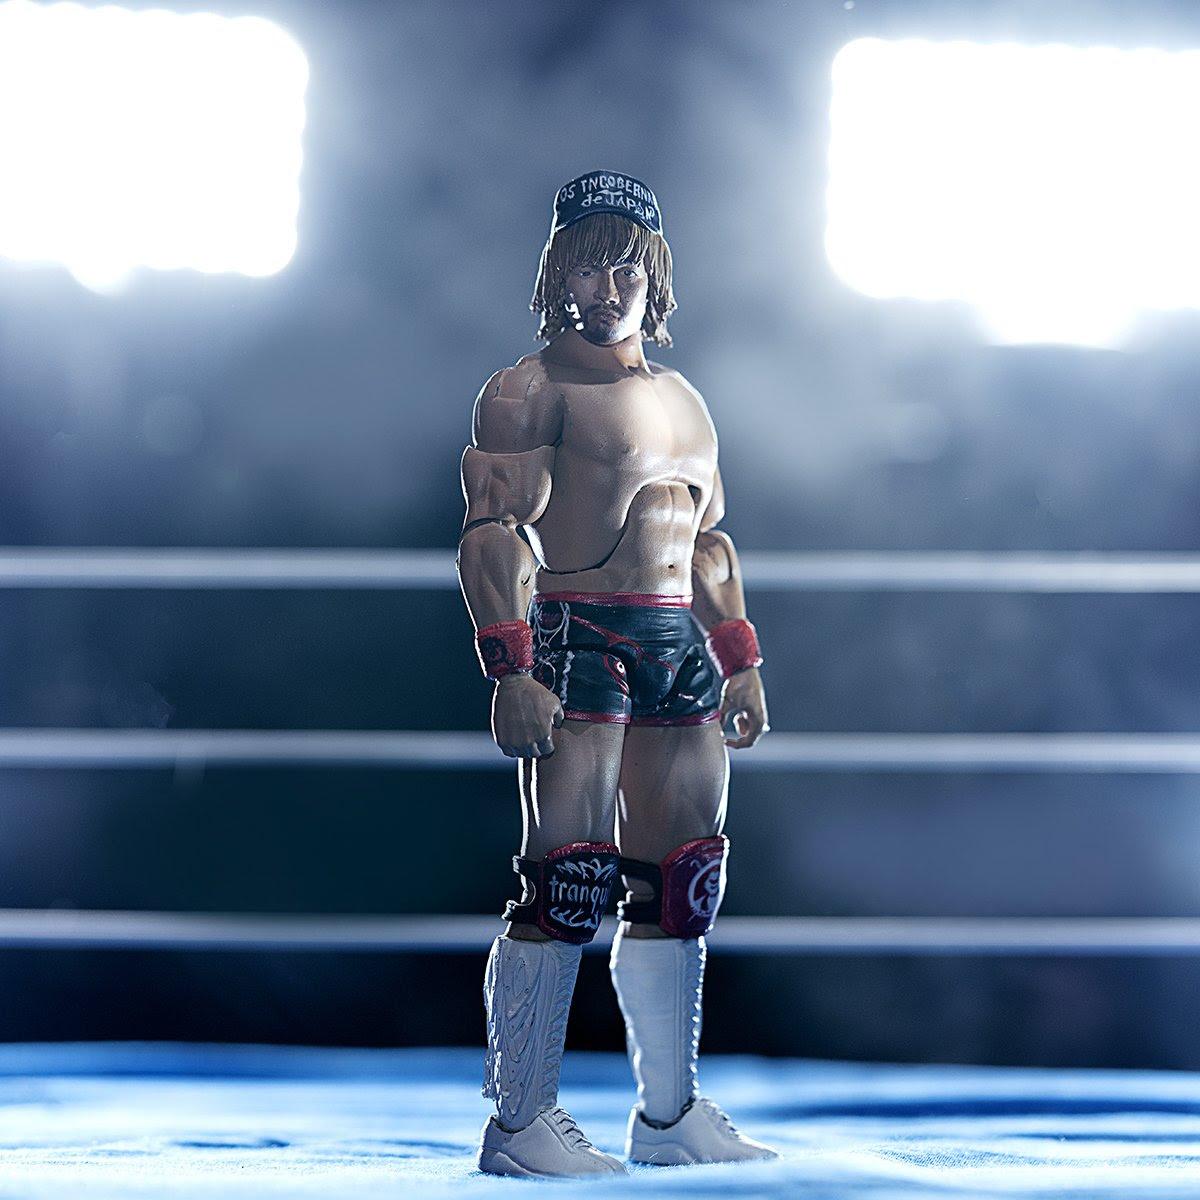 Image of New Japan Pro-Wrestling Ultimate Wave 2 - Tetsuya Naito - Q2 2021